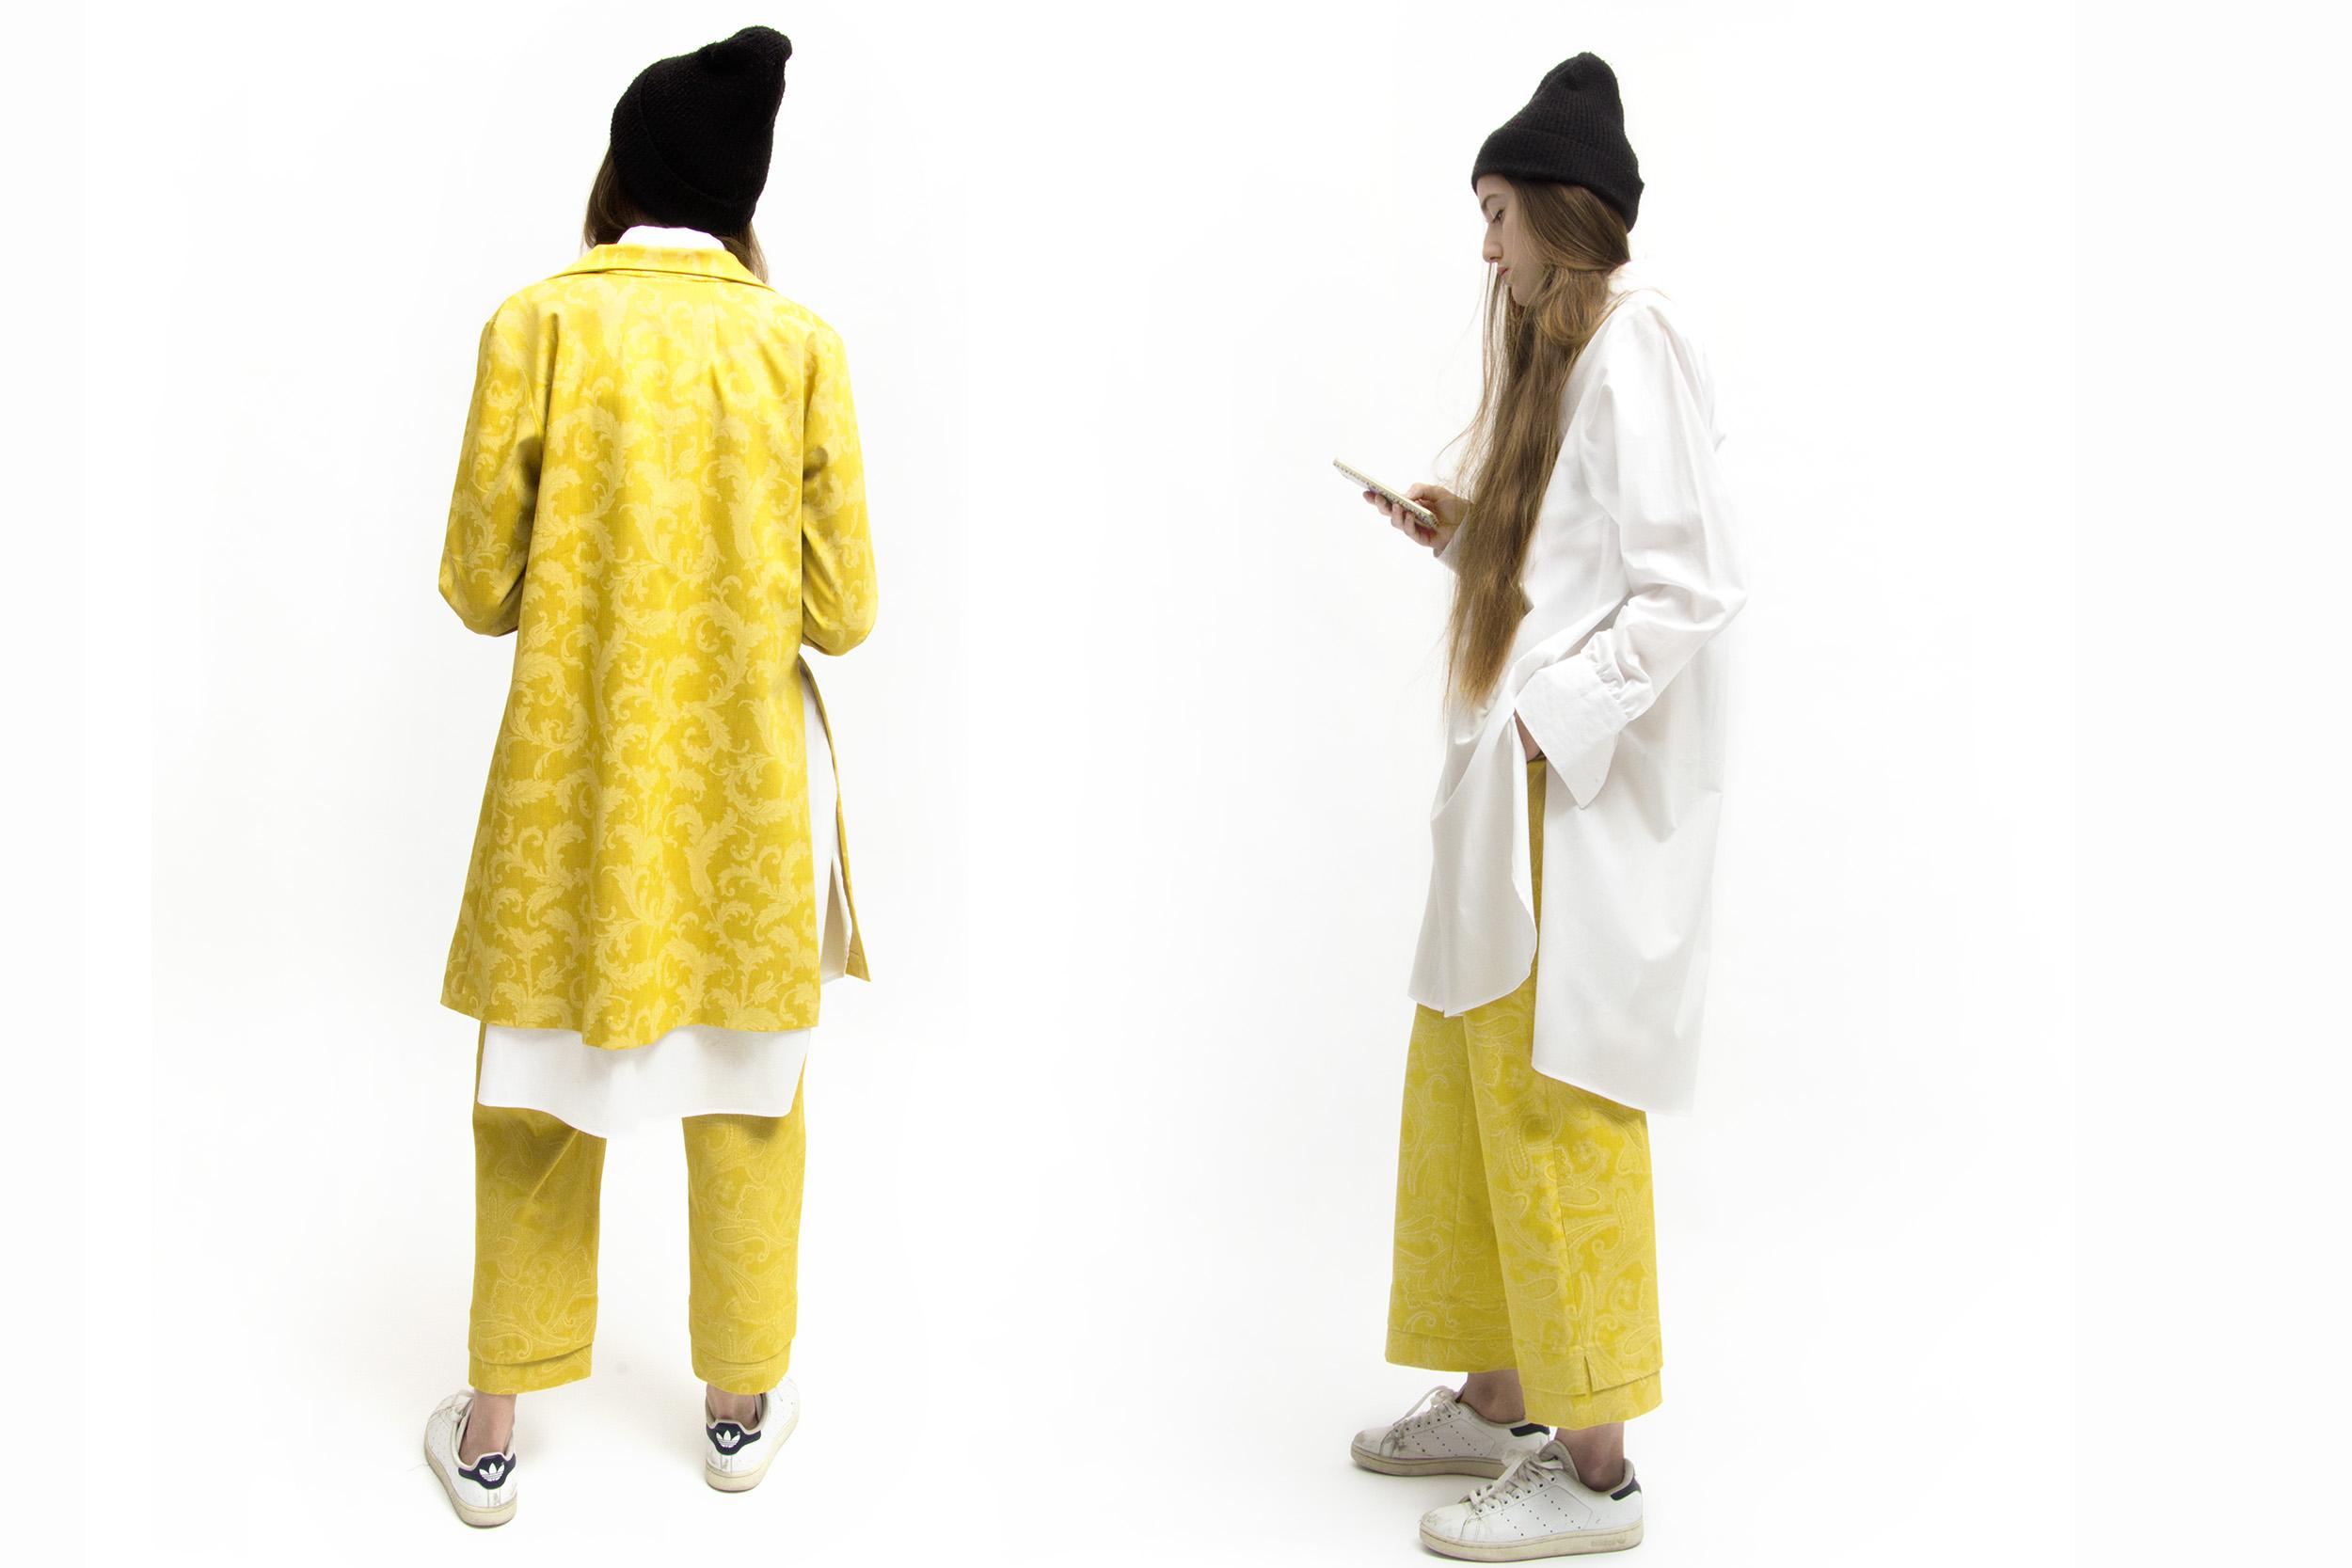 chiara_sonda_fashion_berto_for_young_talents_yellow.jpg